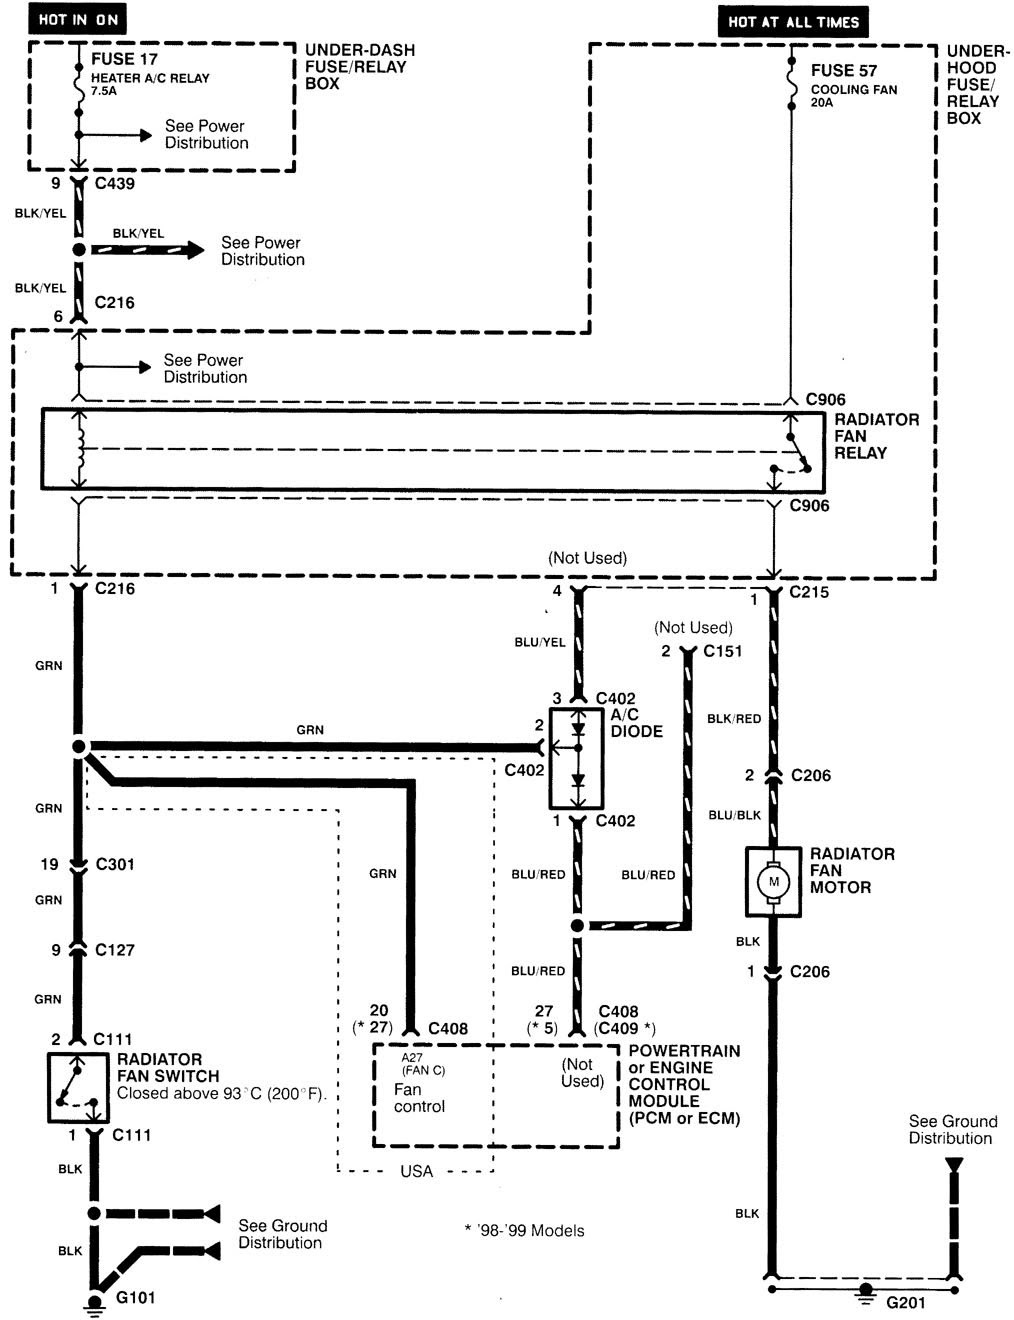 Diagram 95 Integra Fuse Diagram Full Version Hd Quality Fuse Diagram Diagramclothing2 Creasitionline It